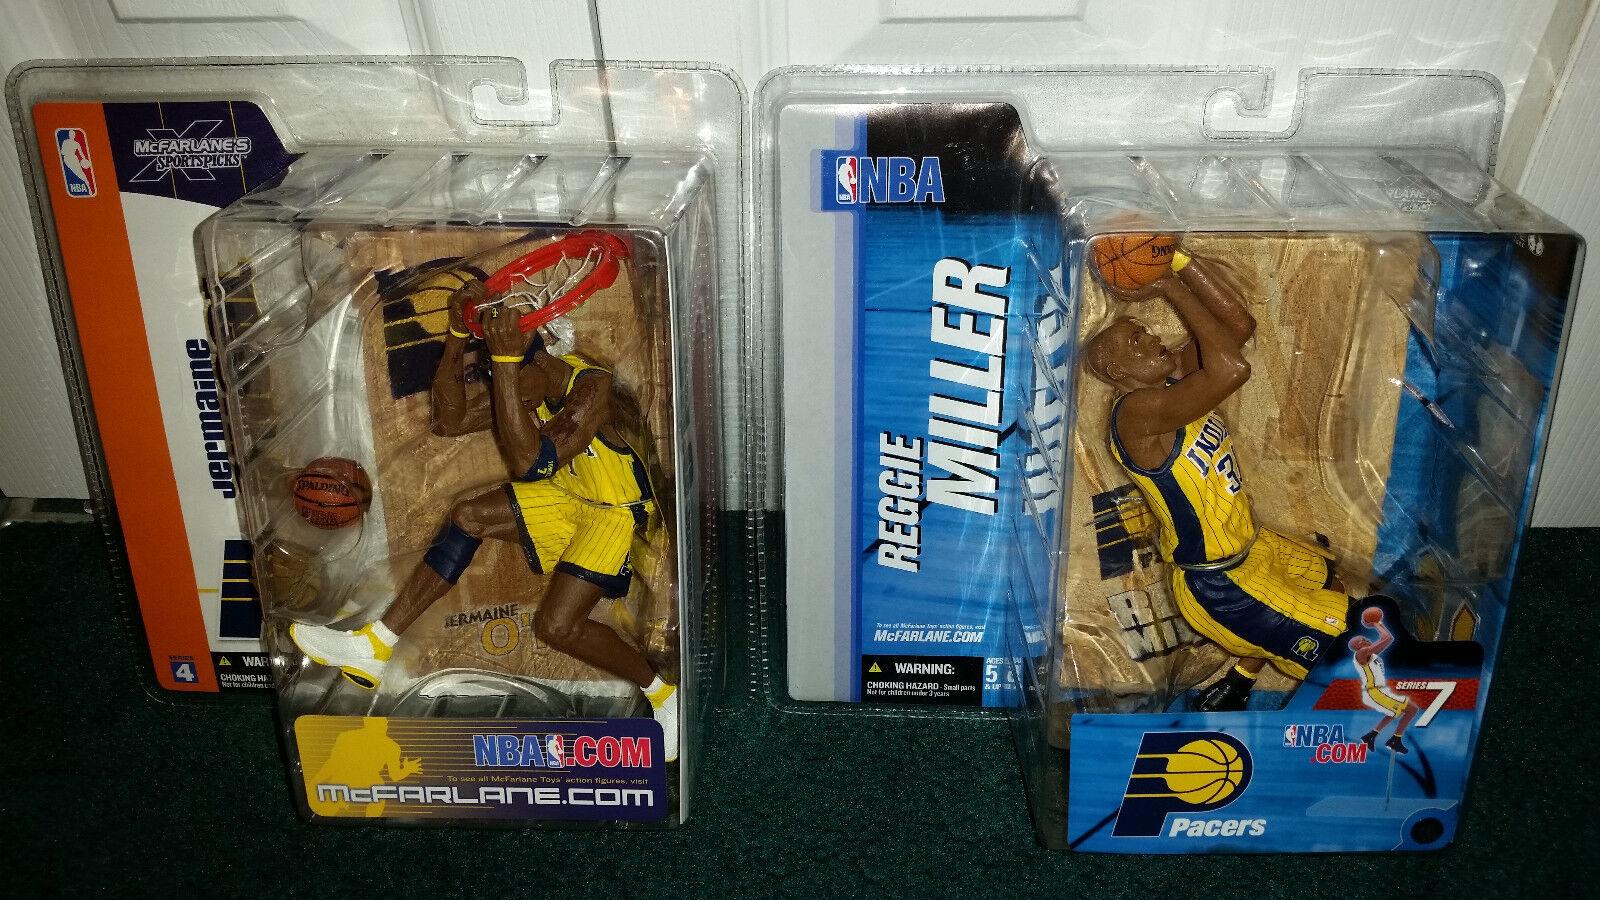 Reggie Miller Variant Jermaine O'neal NBA 7 4 Indiana Pacers Gelb Jersey MISP